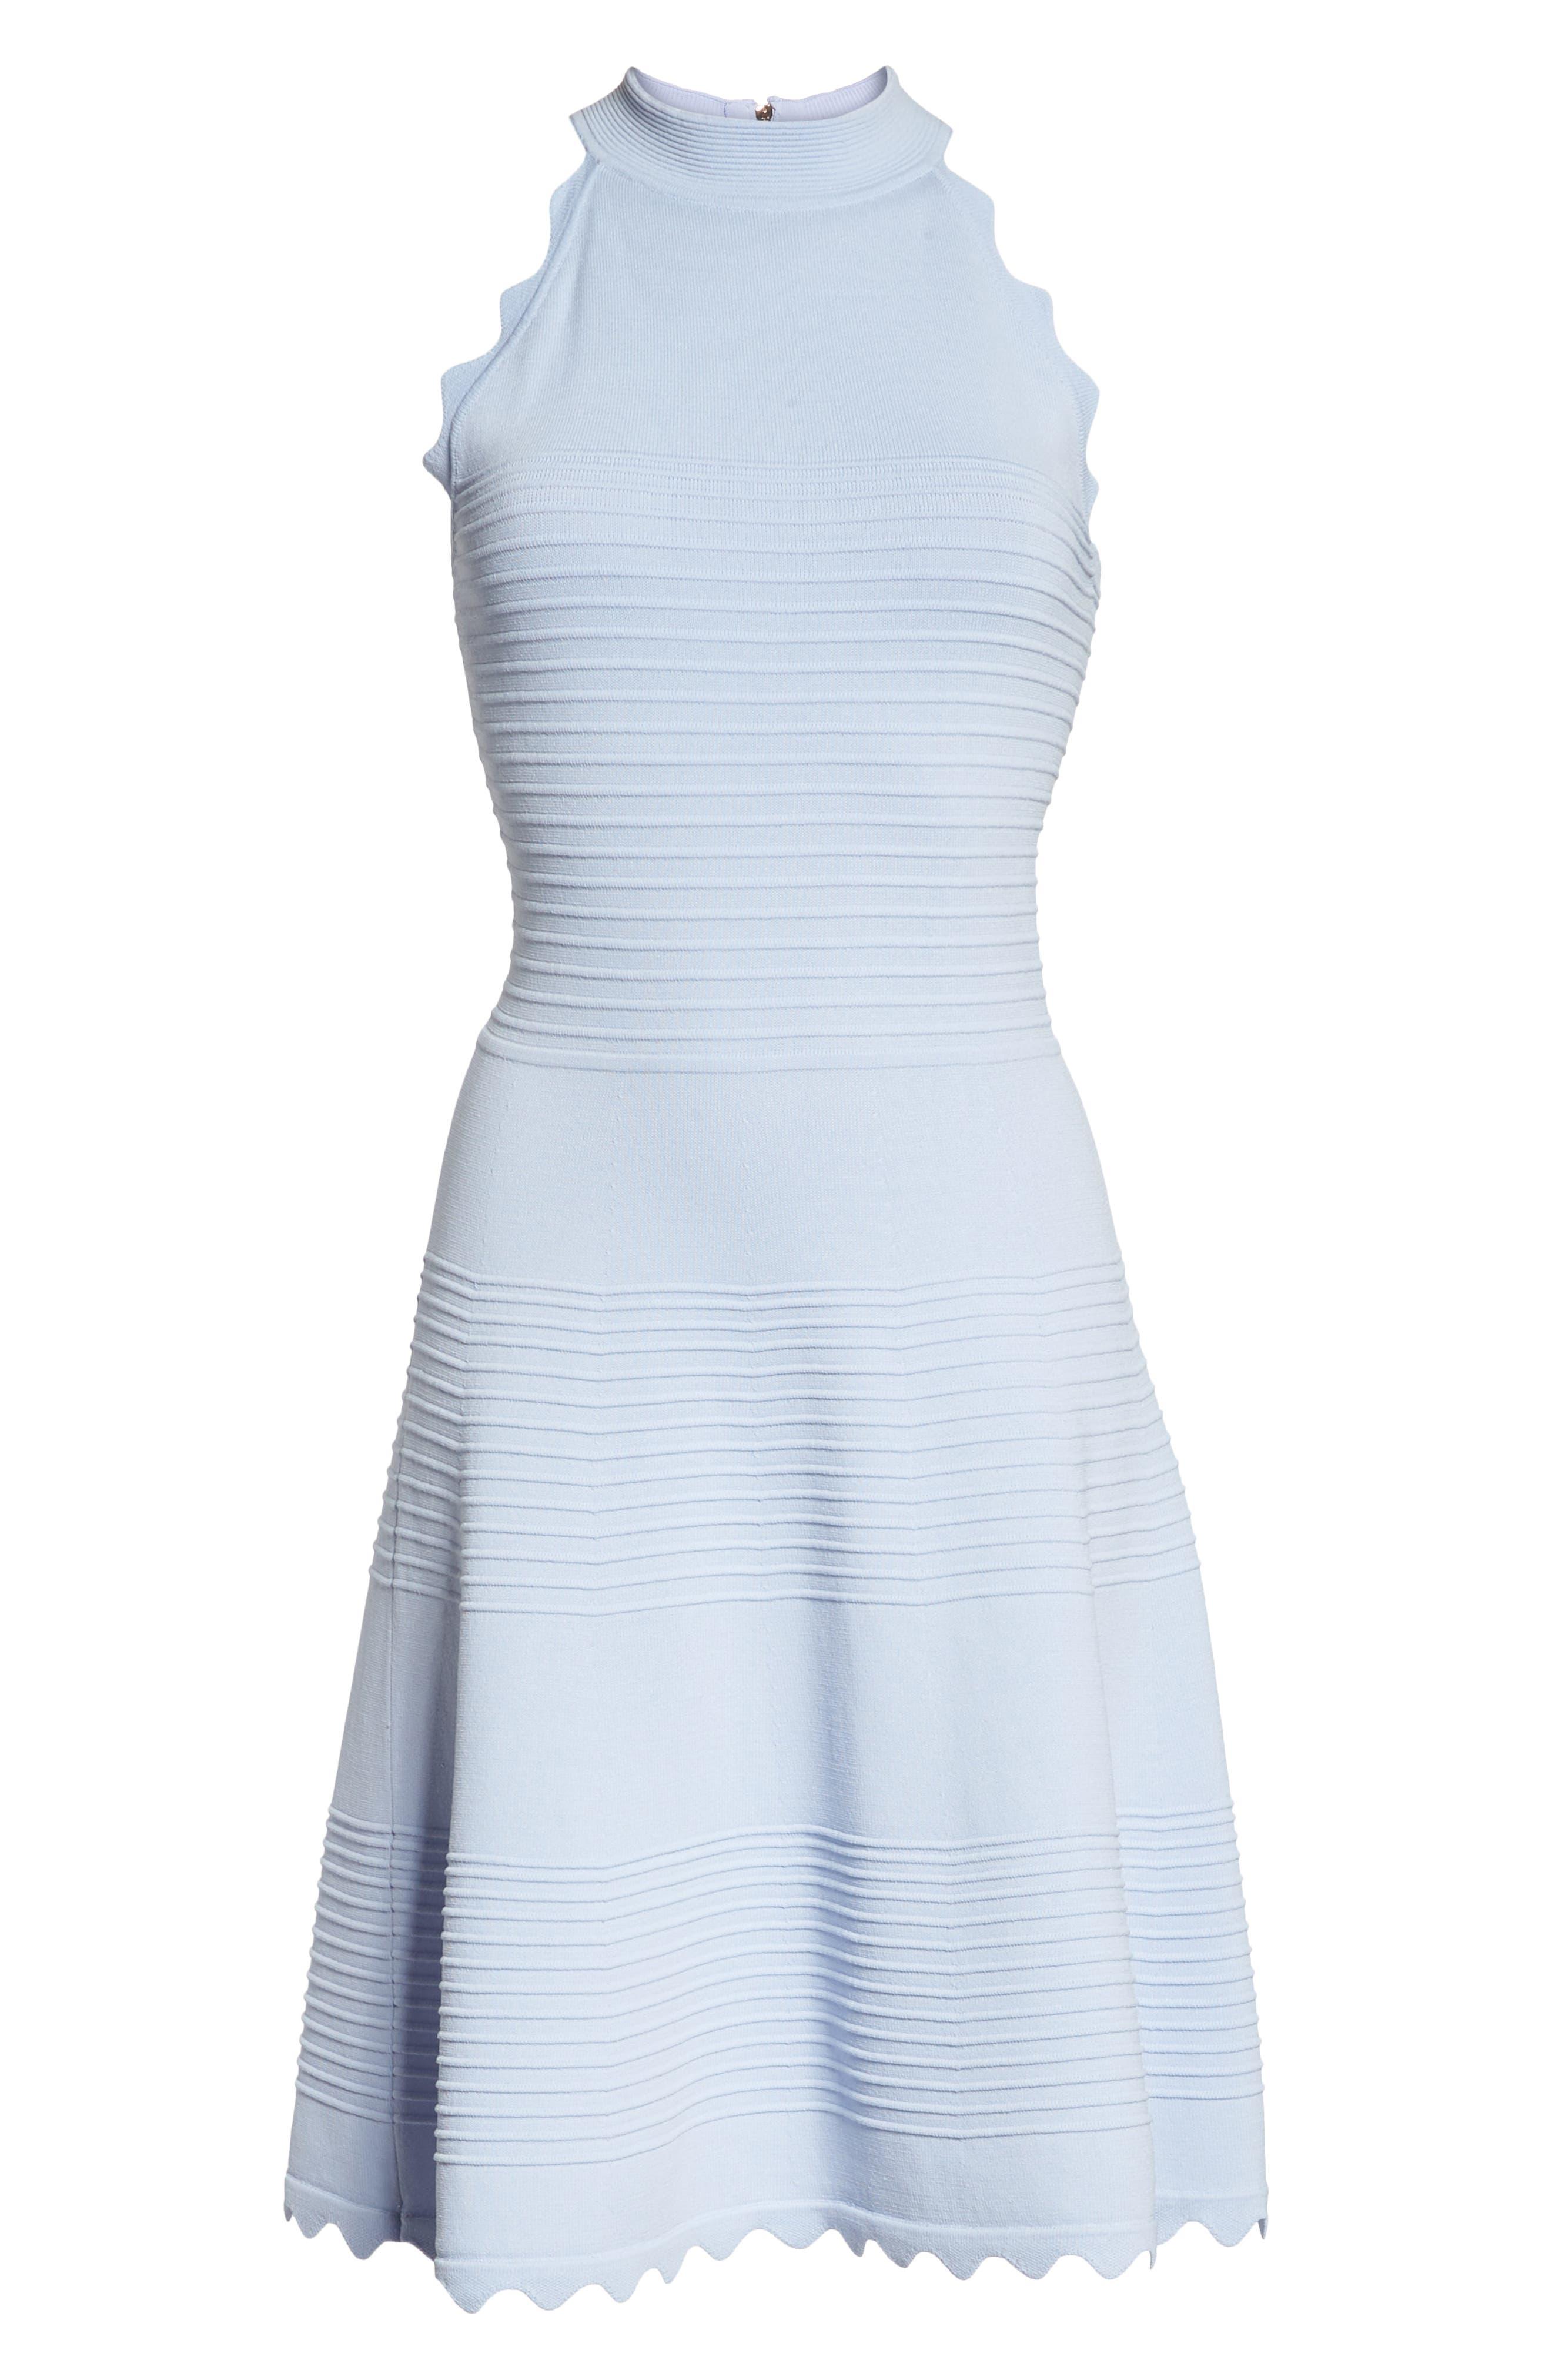 ELIZA J, Fit & Flare Sweater Dress, Alternate thumbnail 7, color, BLUE